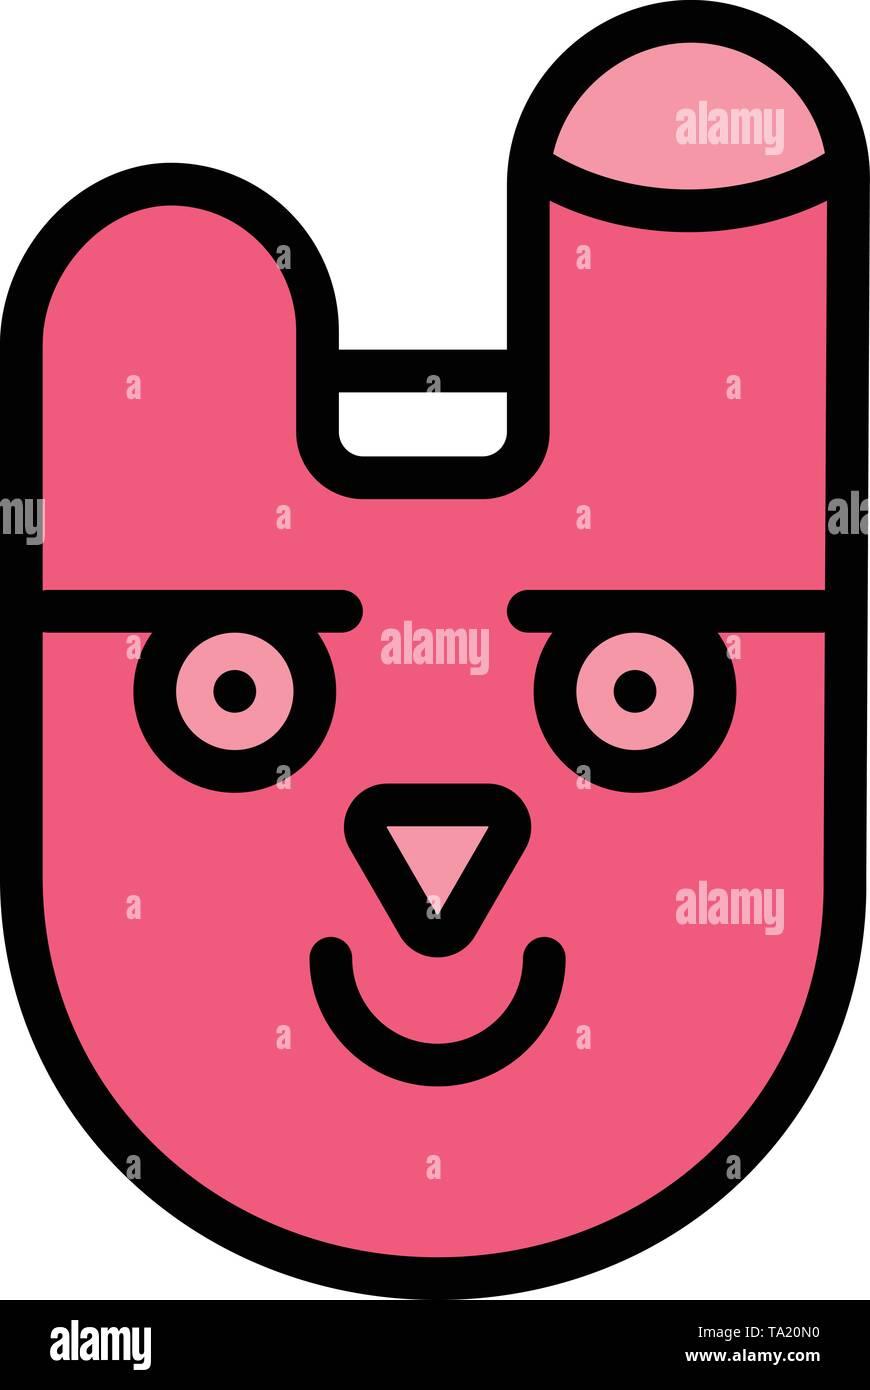 Animal, Bunny, Face, Rabbit Business Logo Template. Flat Color - Stock Image